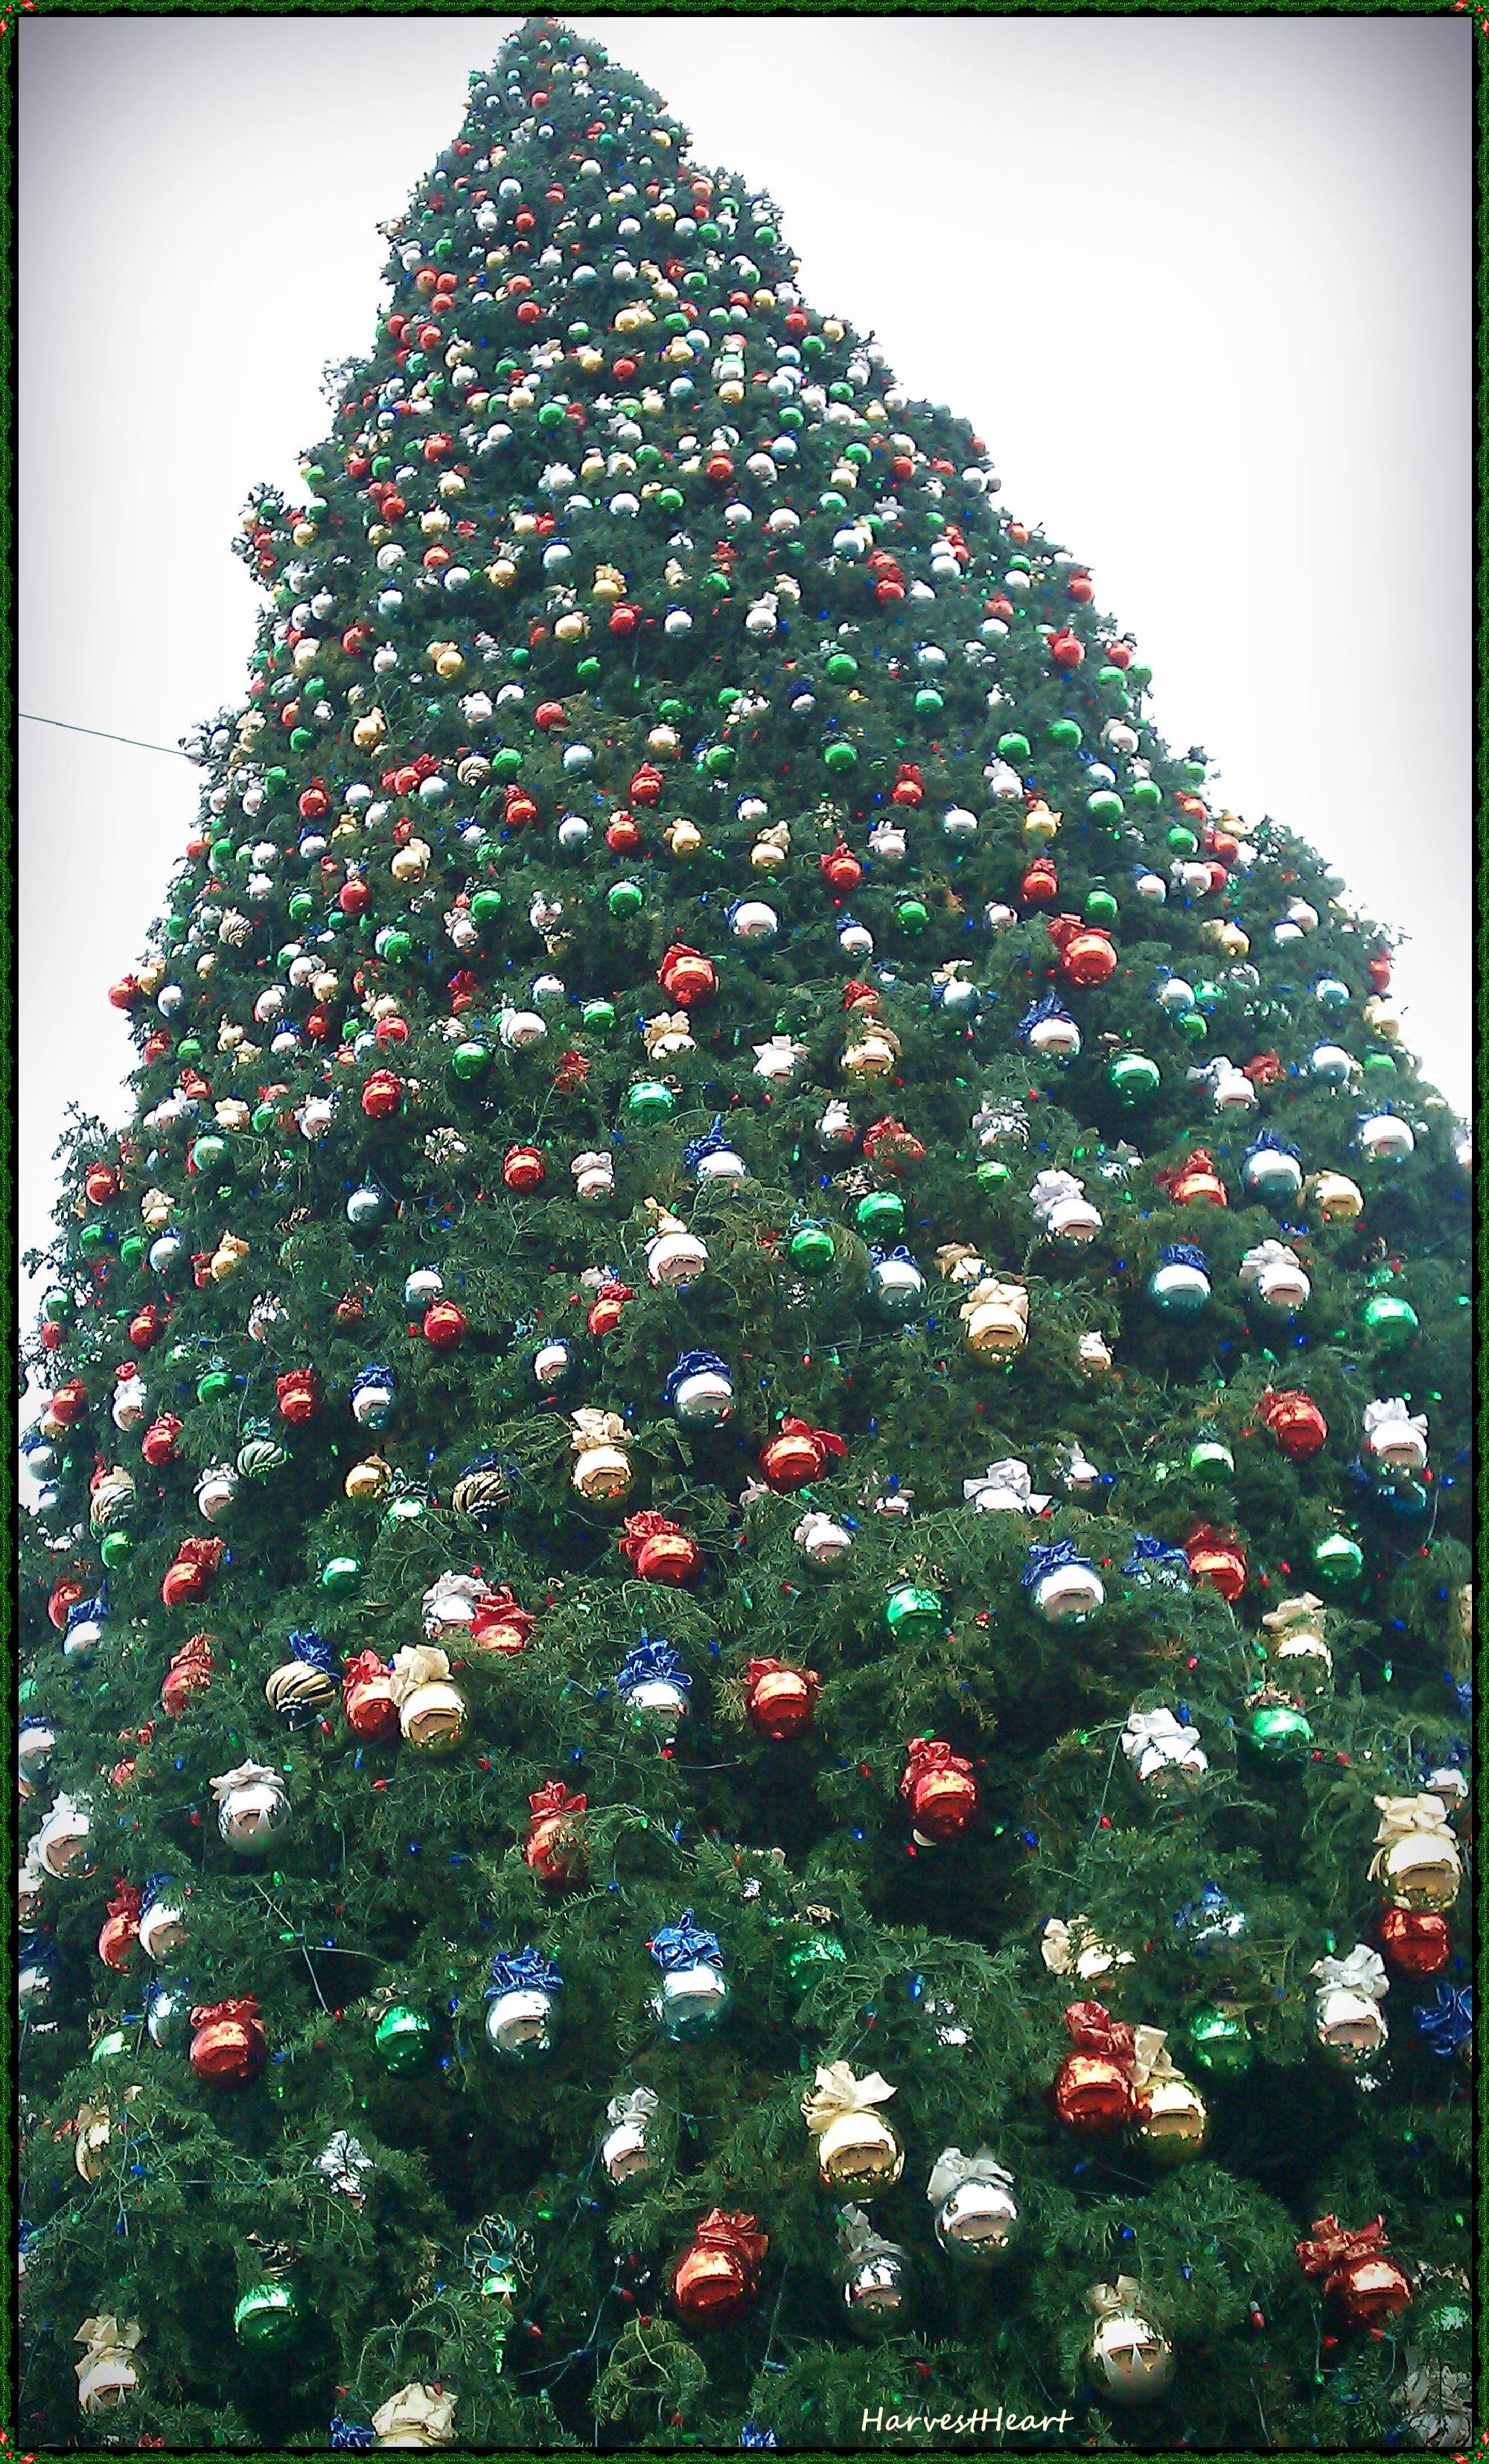 Anthem Christmas Tree tallest holiday tree in Arizona